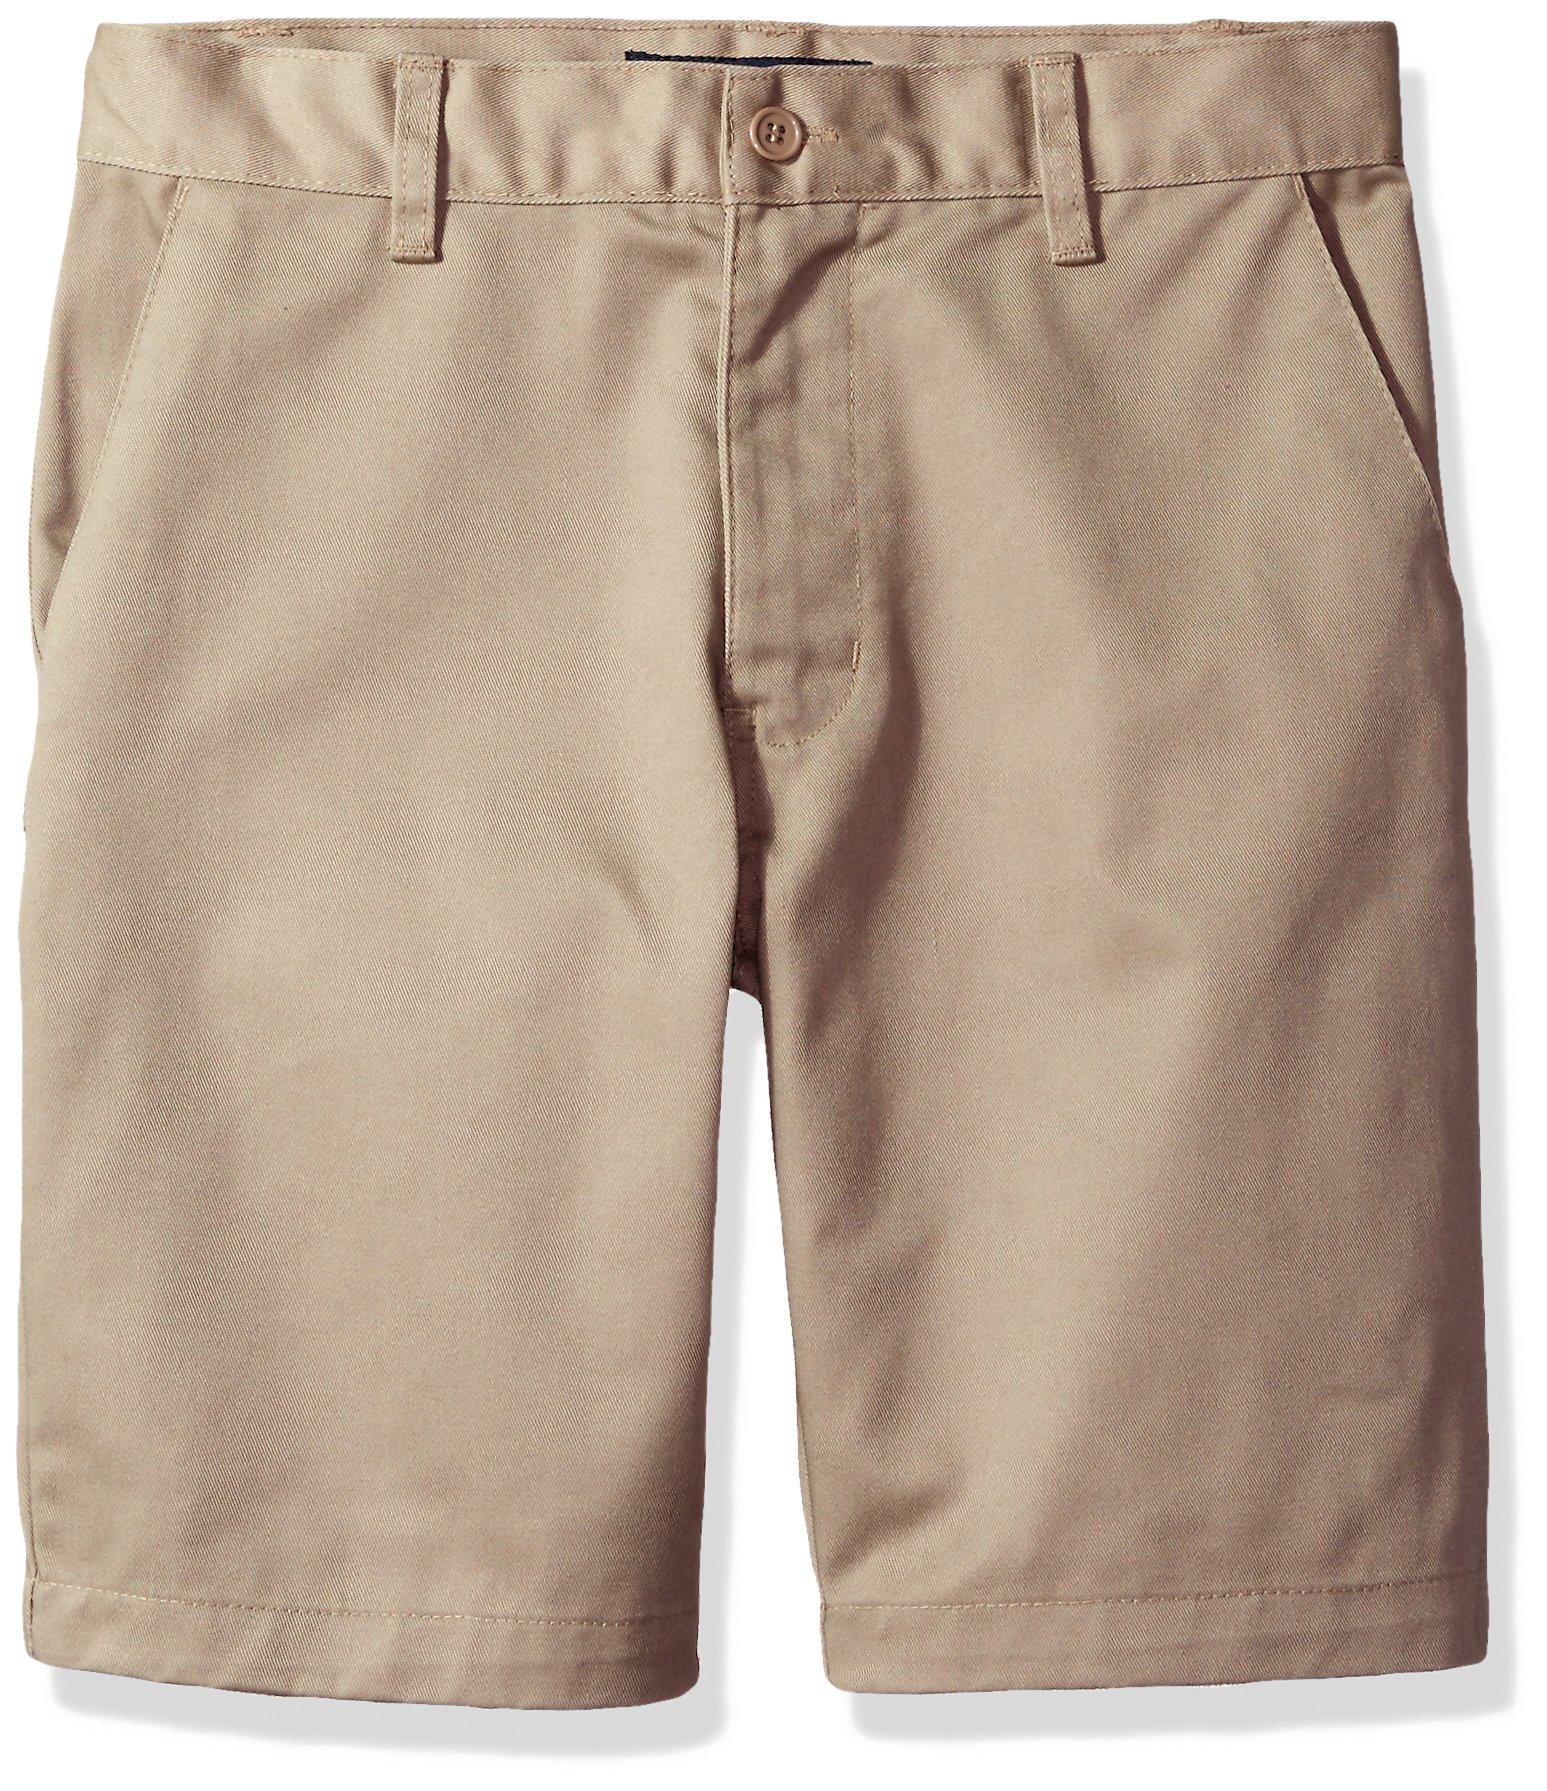 U.S. Polo Assn. Big Boys' Twill Short (More Styles Available), Khaki-IIIBEB, 20 by U.S. Polo Assn. (Image #1)